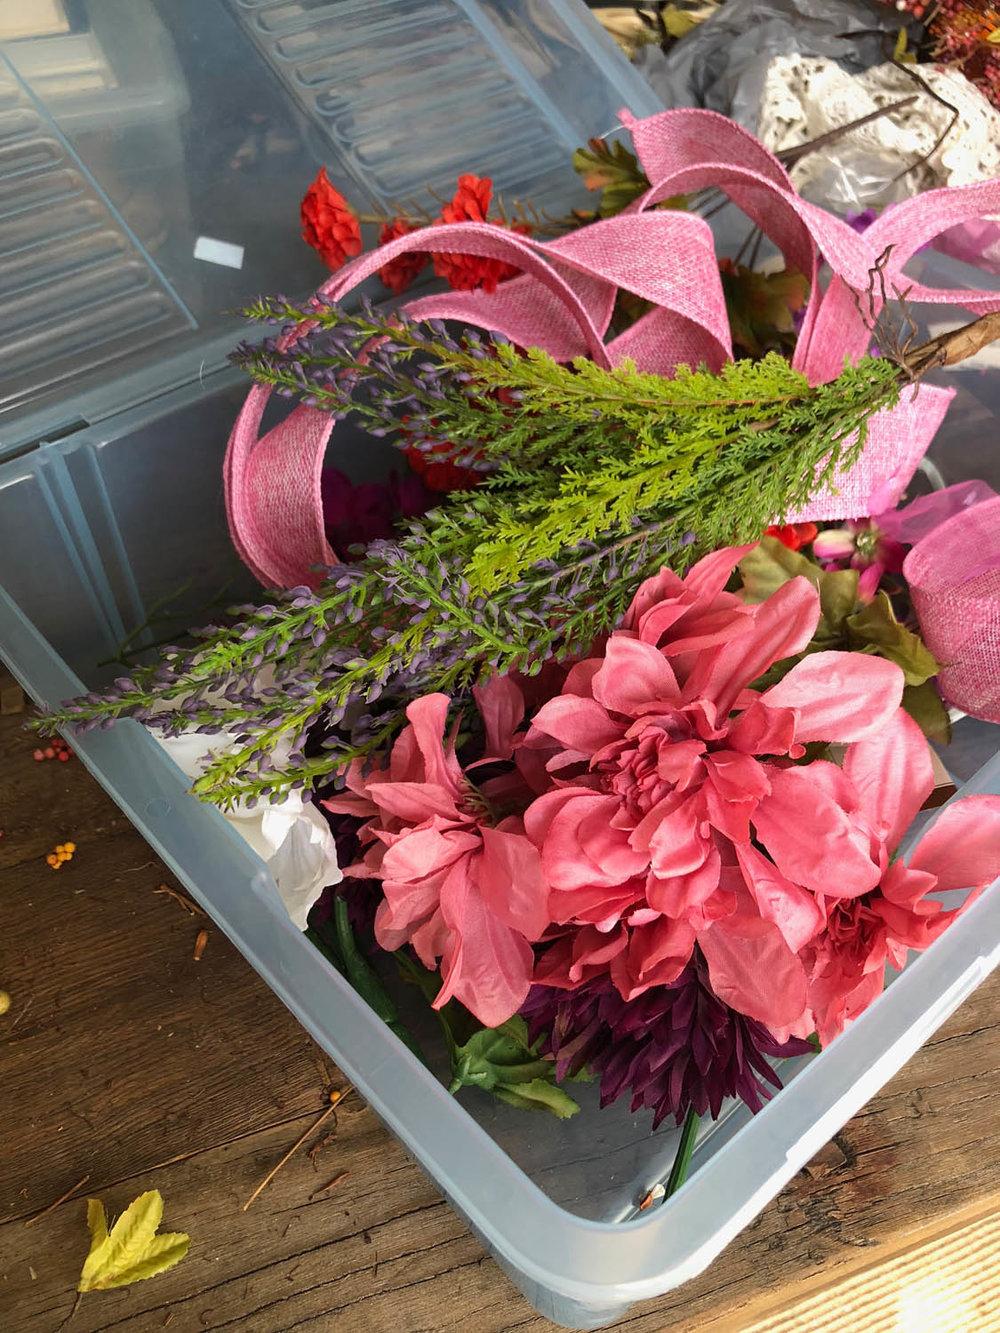 bin of silk flowers ribbons and greenery